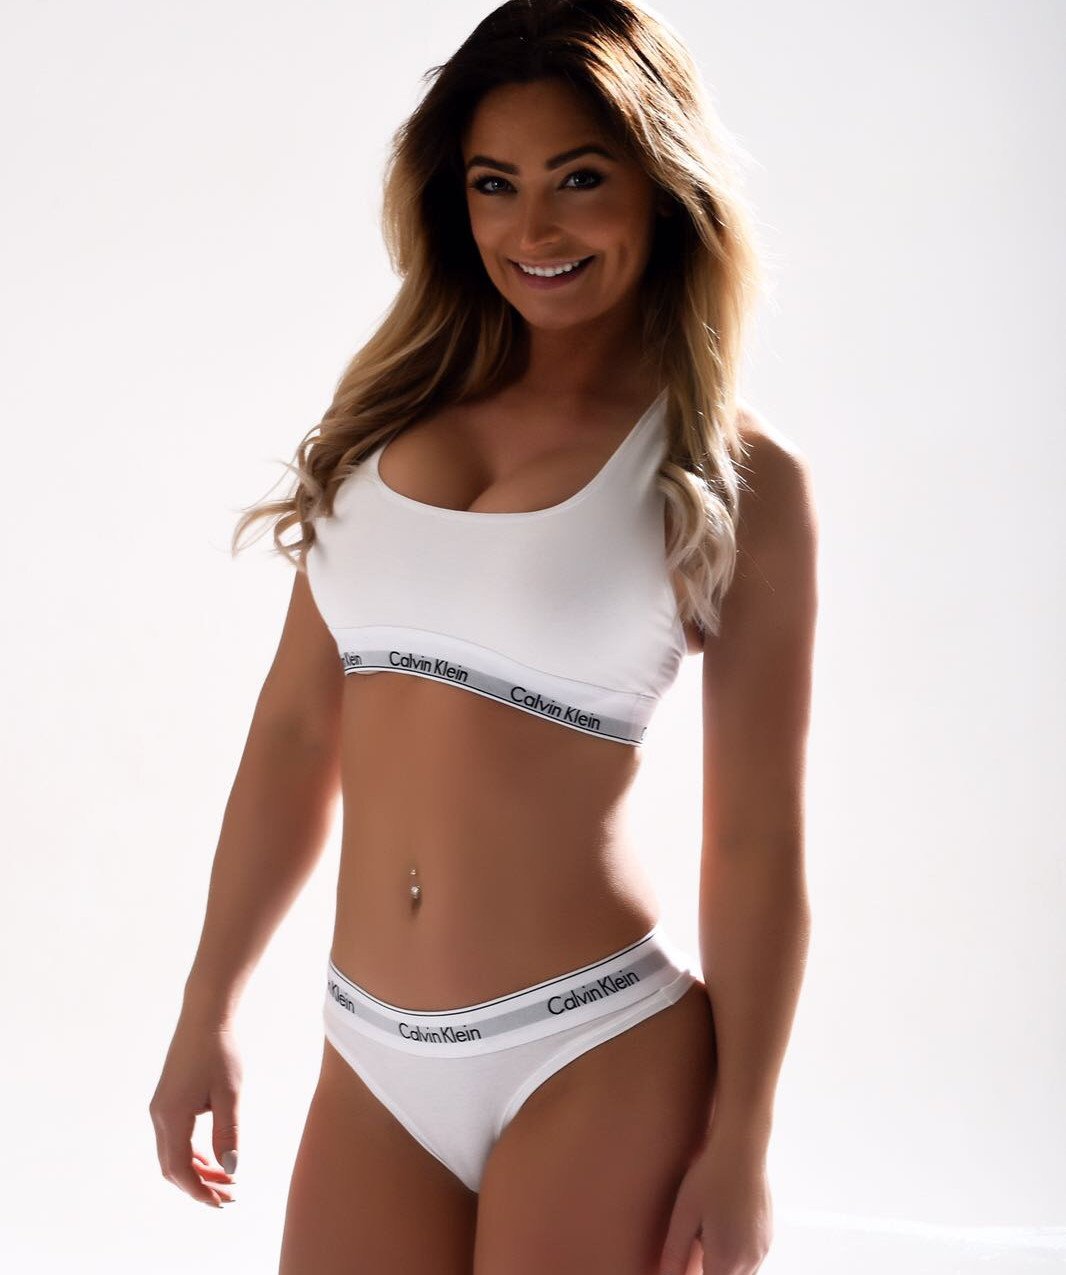 Jasmine Hotz